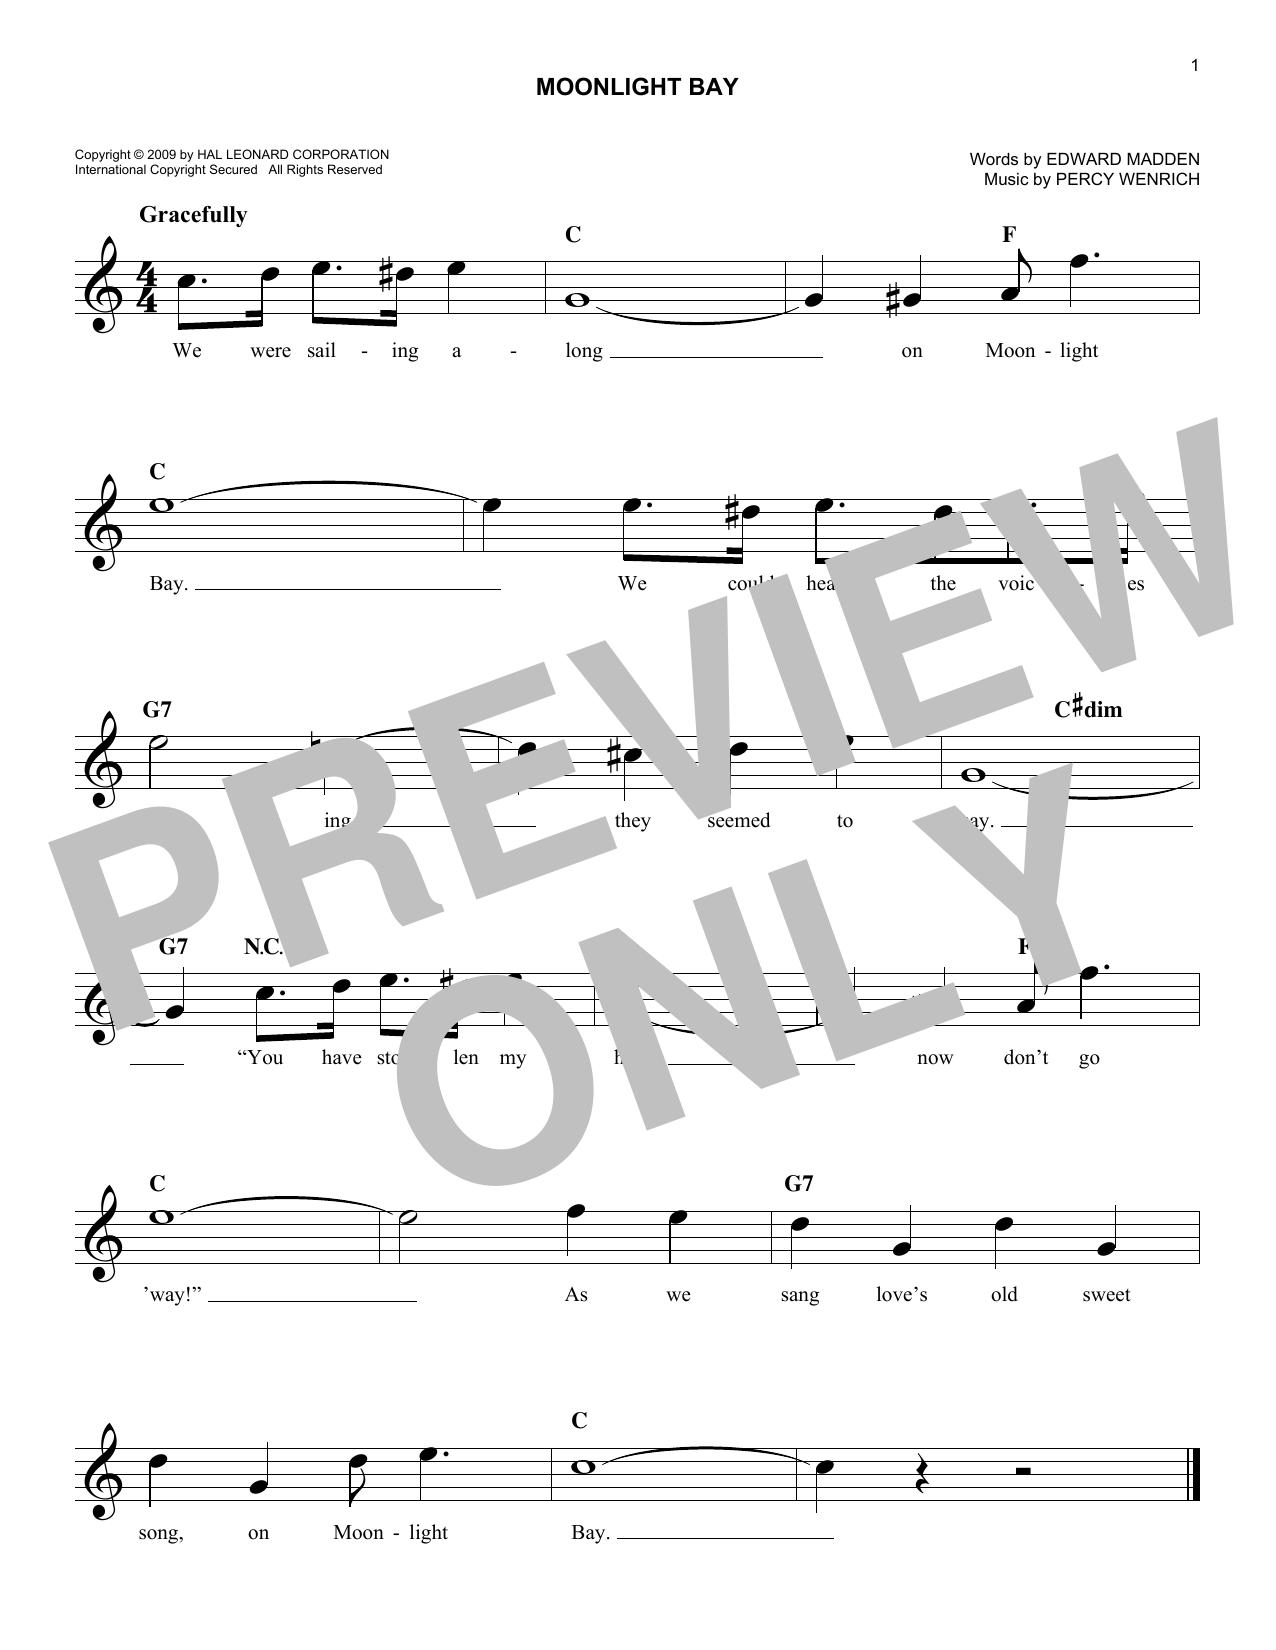 Edward Madden Moonlight Bay sheet music notes and chords. Download Printable PDF.